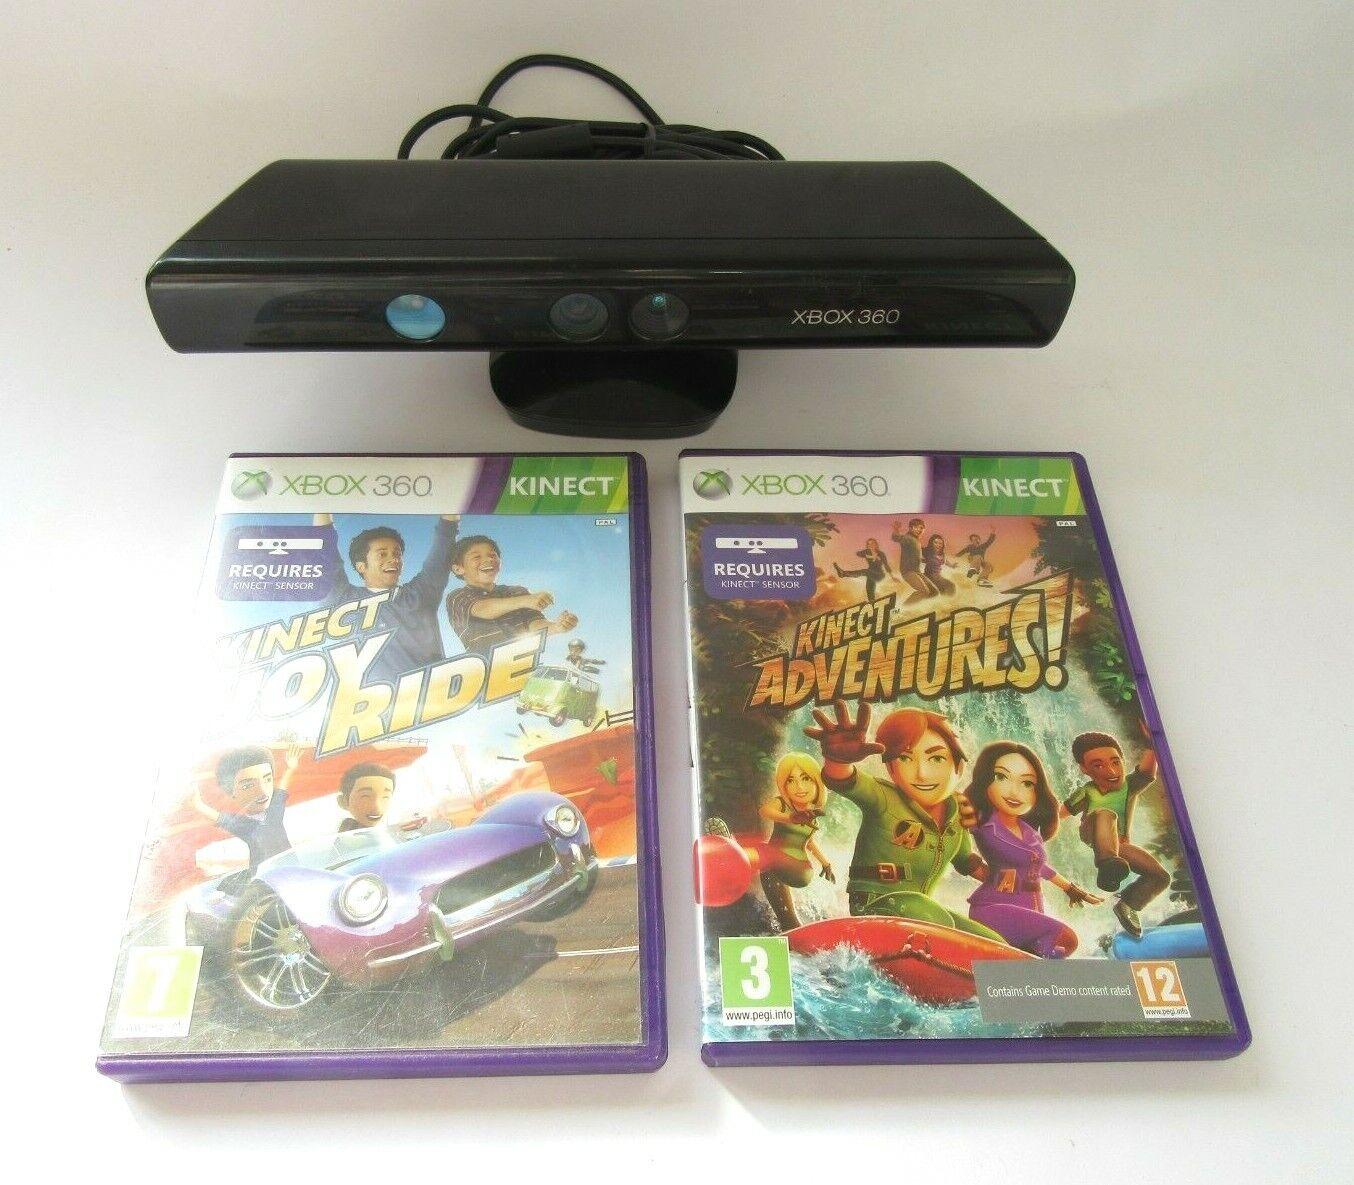 Official Microsoft Xbox 360 Kinect Sensor Bar With 2 Kinect Games PAL